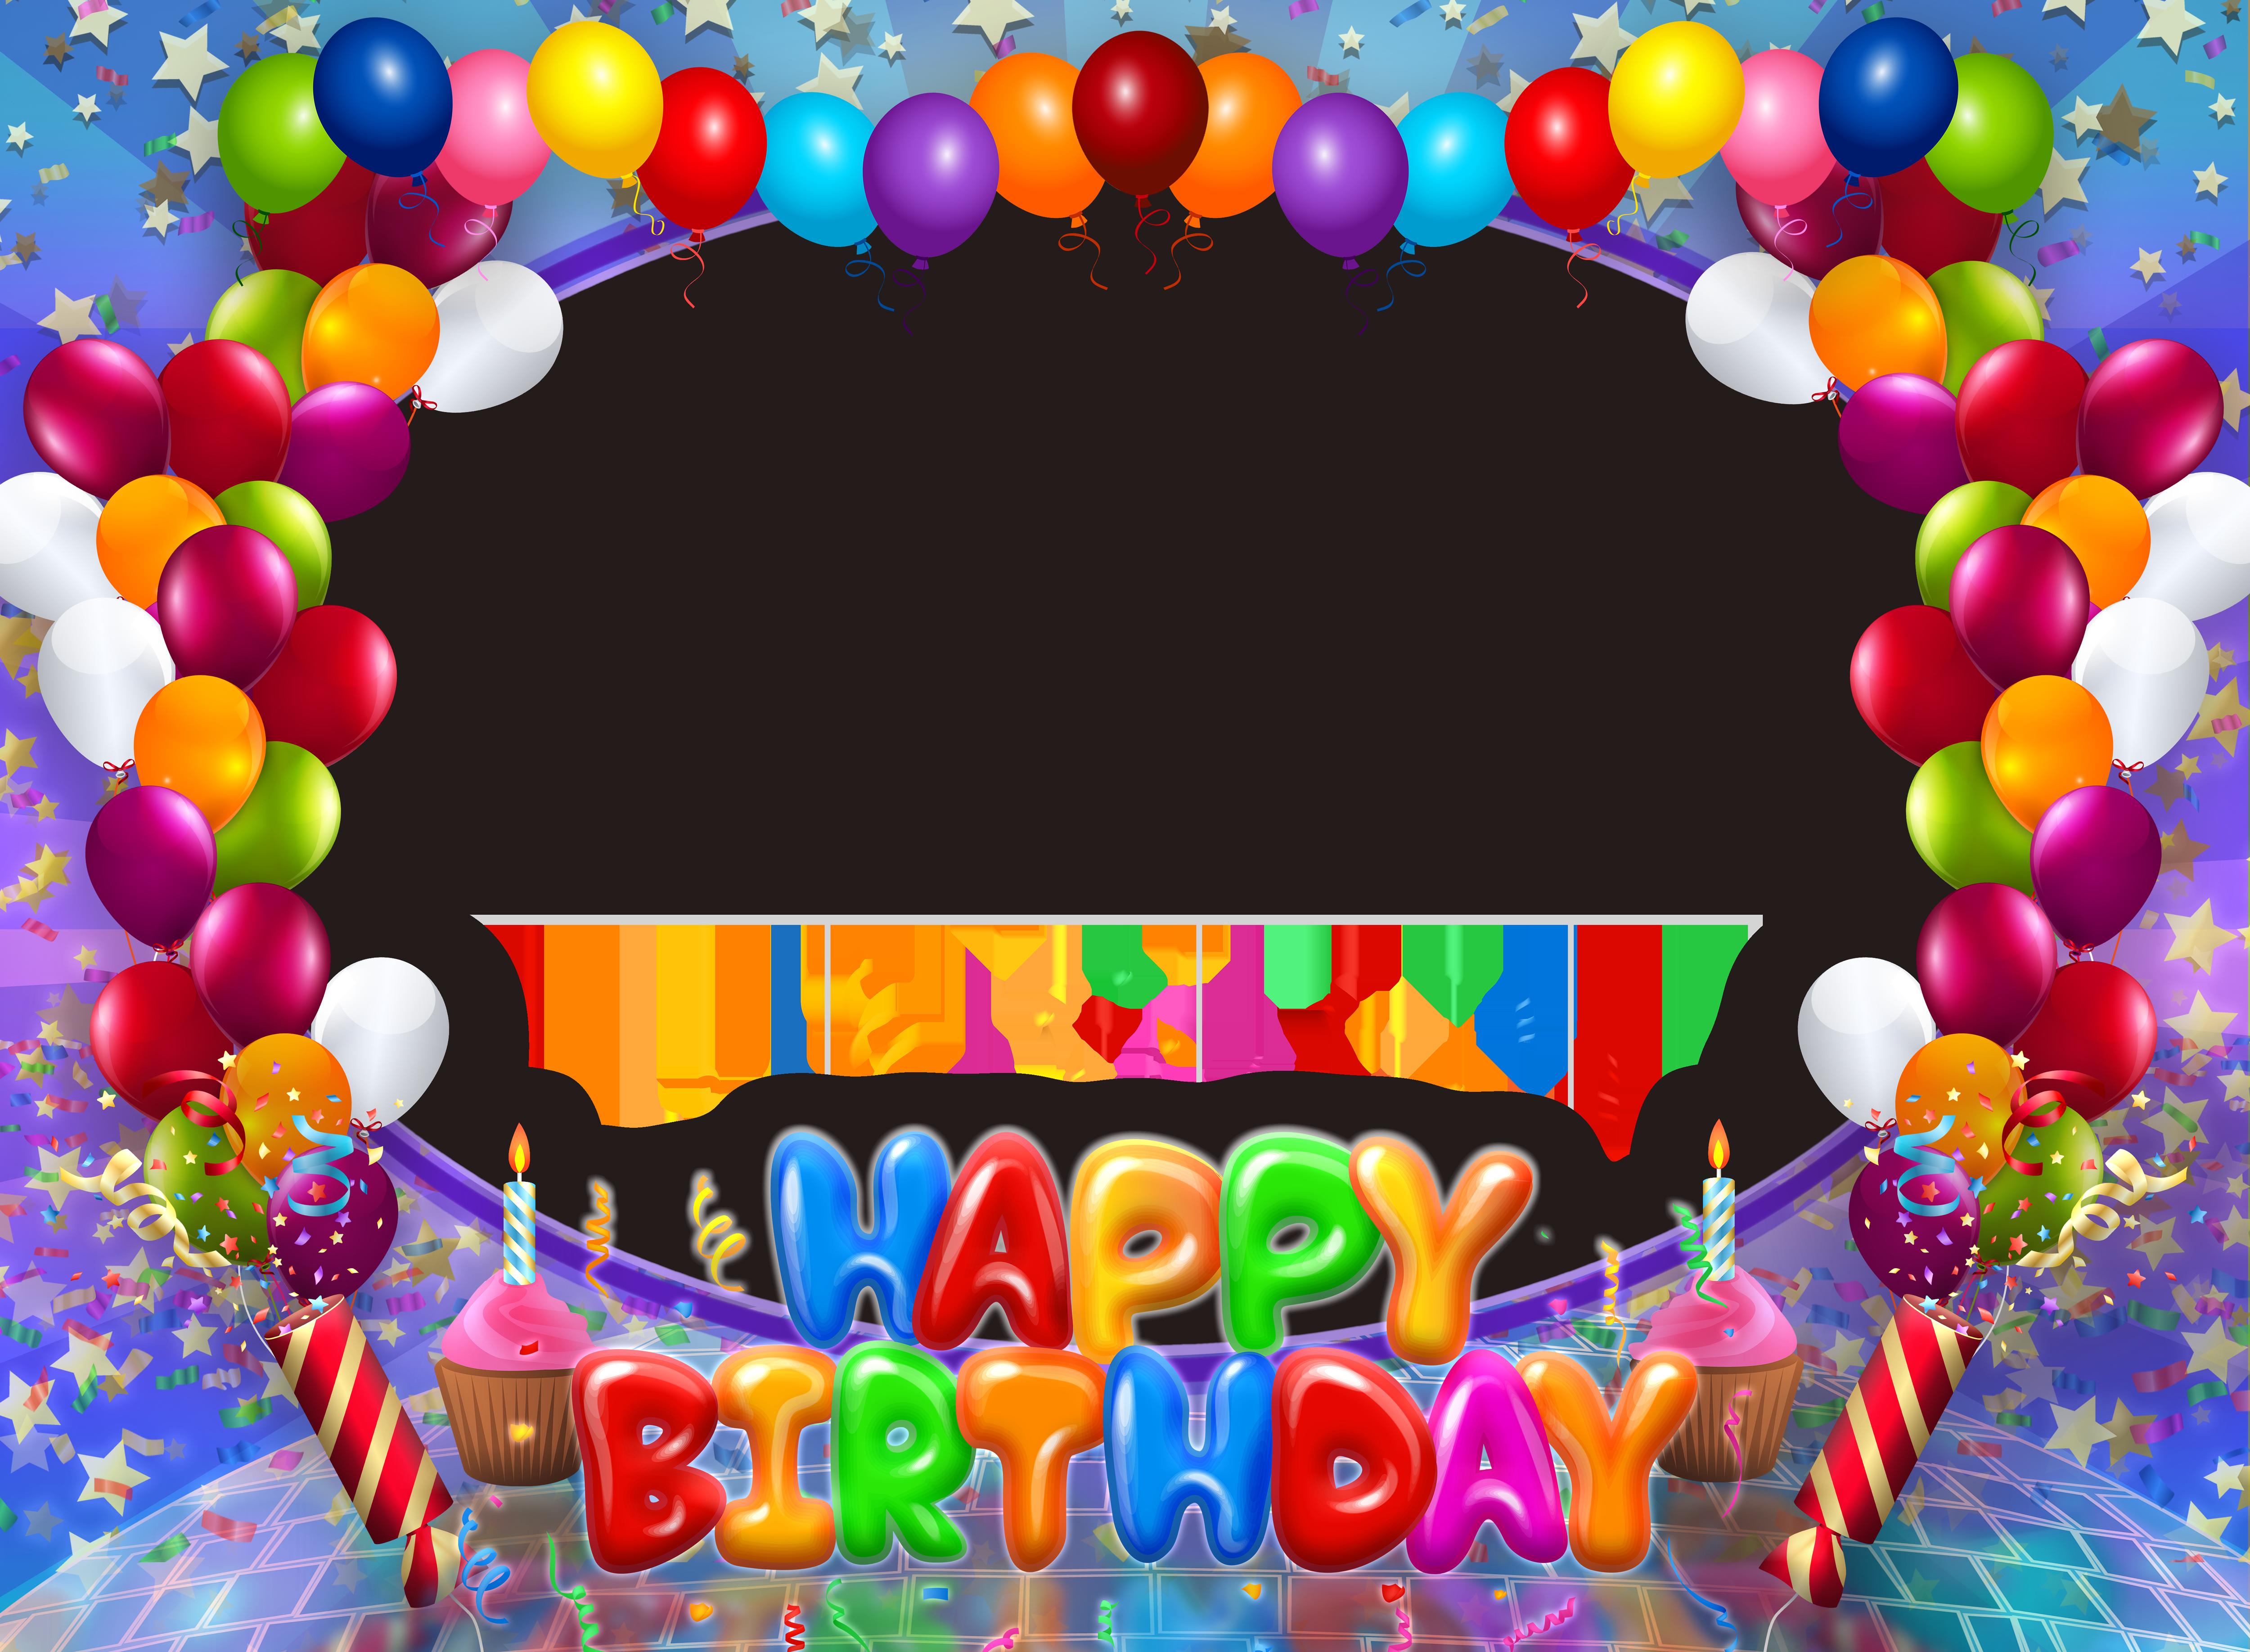 Frames clipart celebration. Happy birthday transparent png